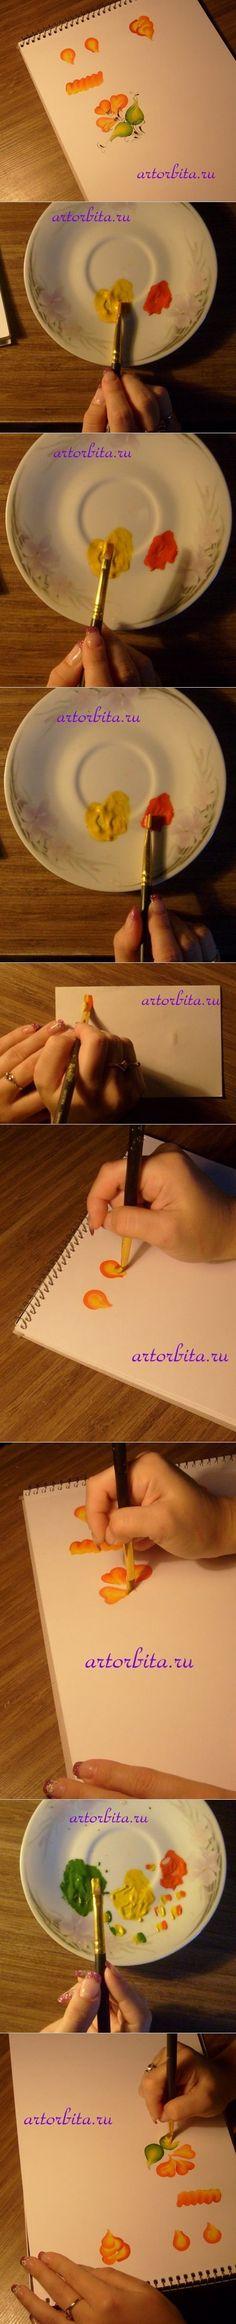 How to Draw Flowers with Double Loaded Brushstroke   www.FabArtDIY.com LIKE Us on Facebook ==> https://www.facebook.com/FabArtDIY